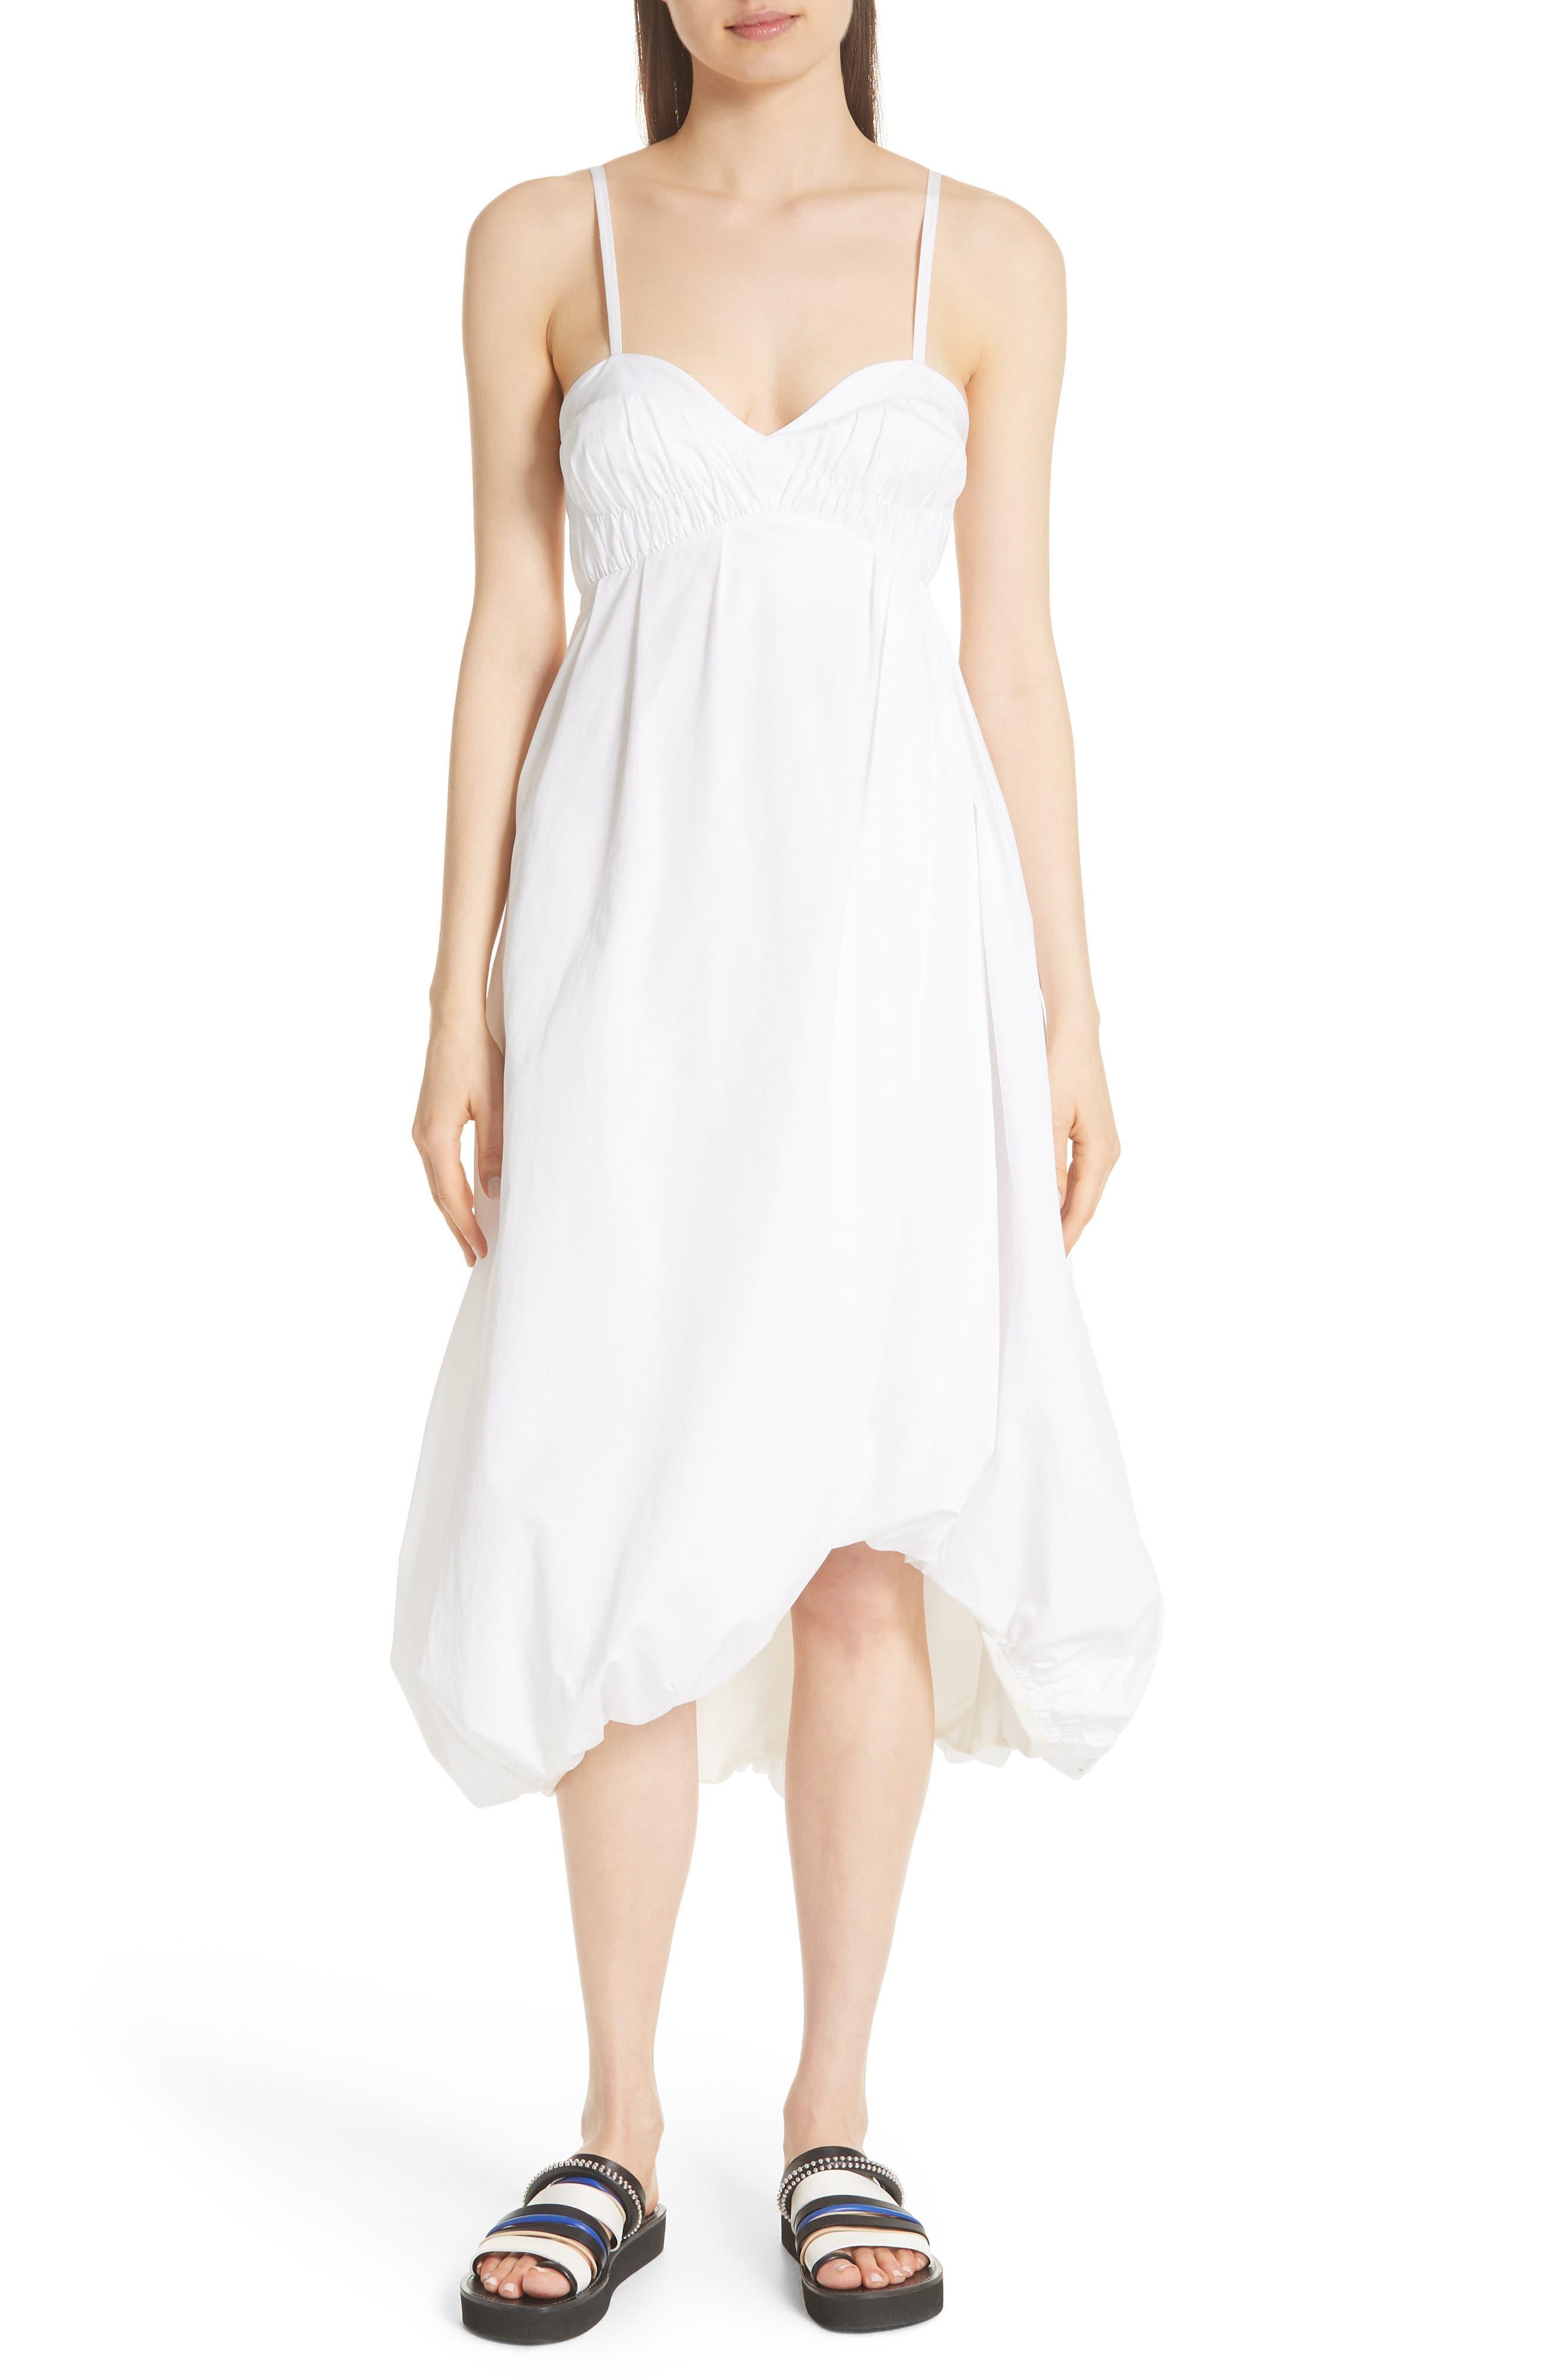 Main Image - 3.1 Phillip Lim Bubble Hem Dress